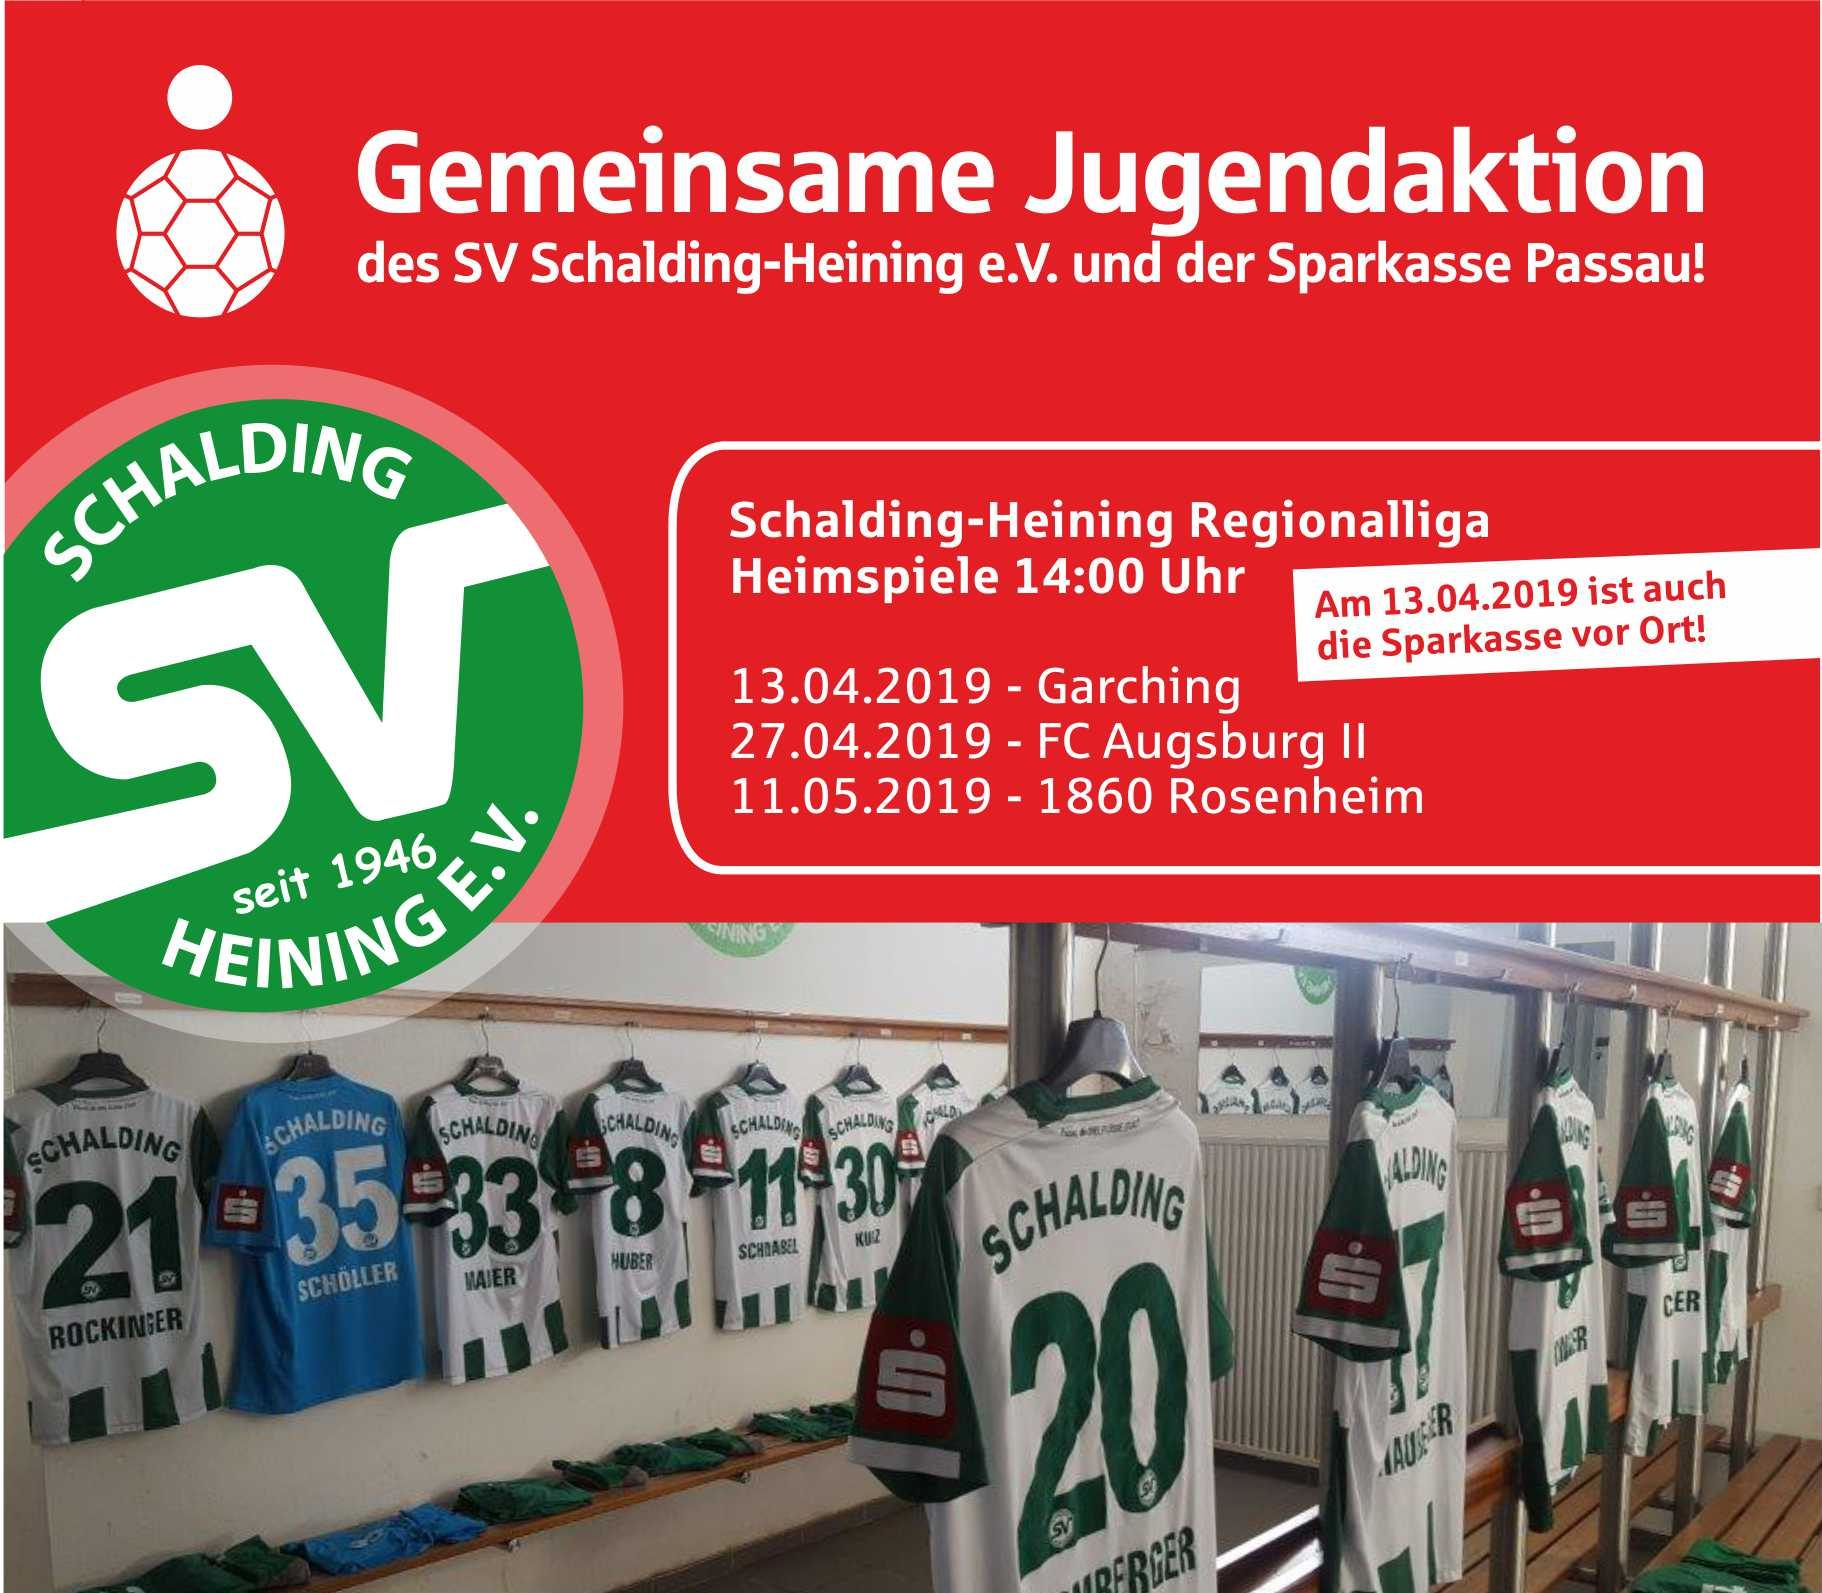 Sparkasse Passau - Trikot des SV Schalding-Heining e.V.